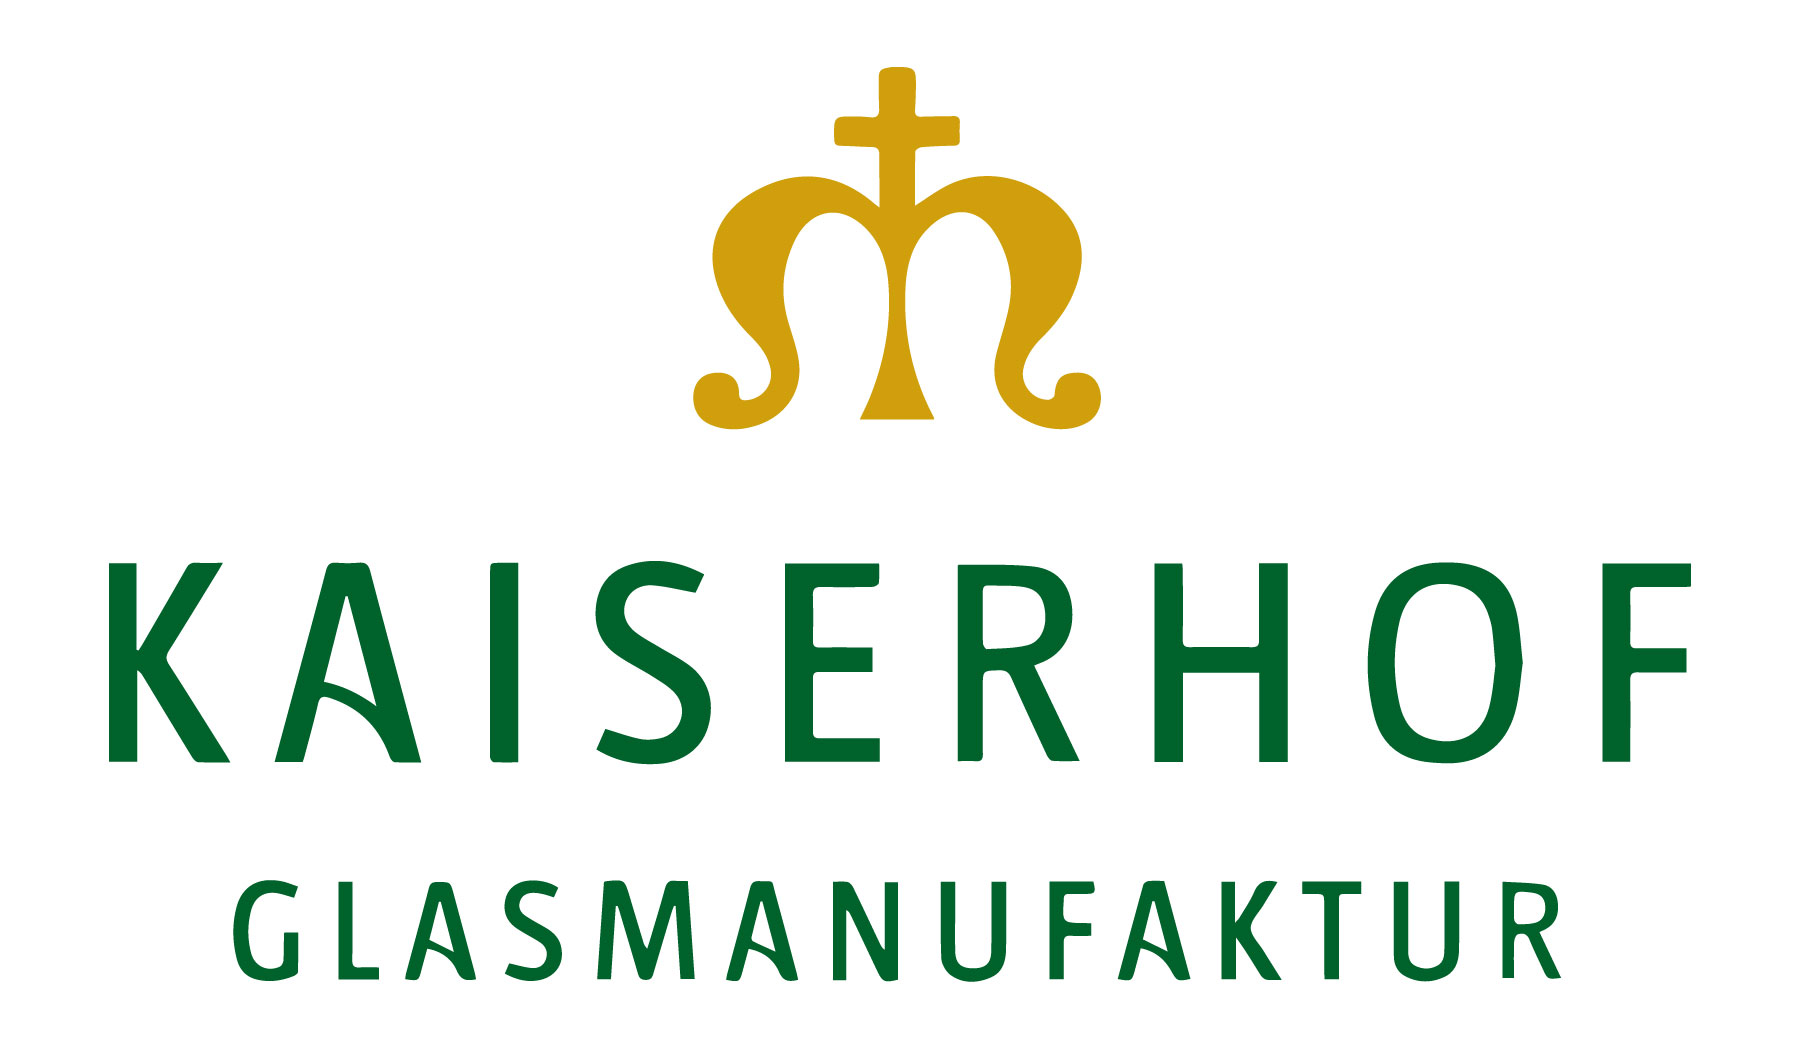 Kaiserhof Glasmanufaktur